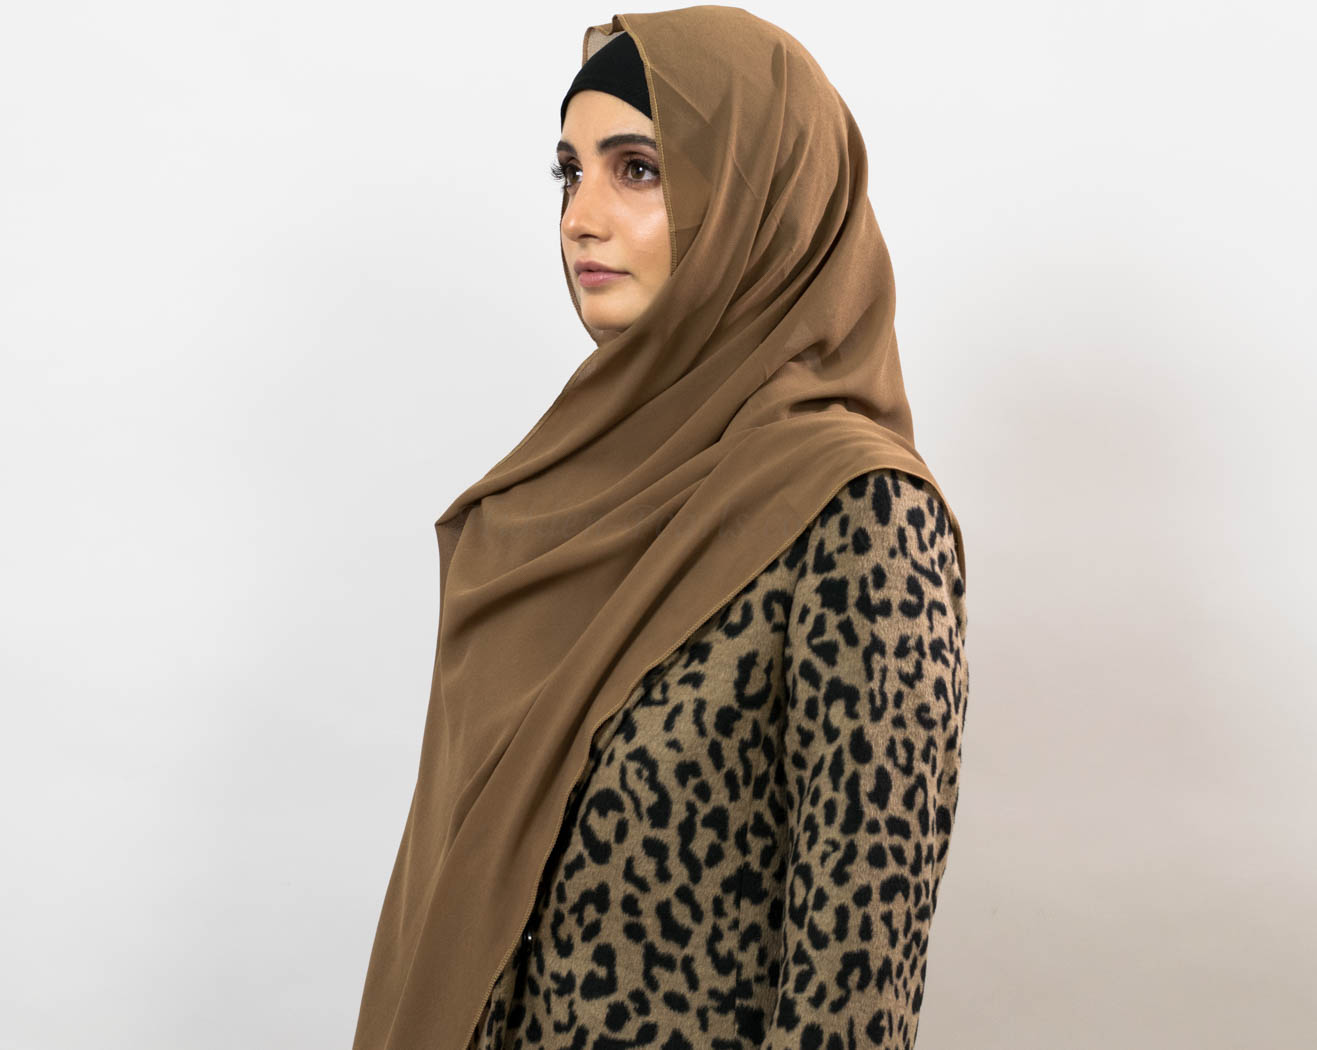 Everyday Chiffon Hijab - Mocha 3 - Hidden Pearls copy